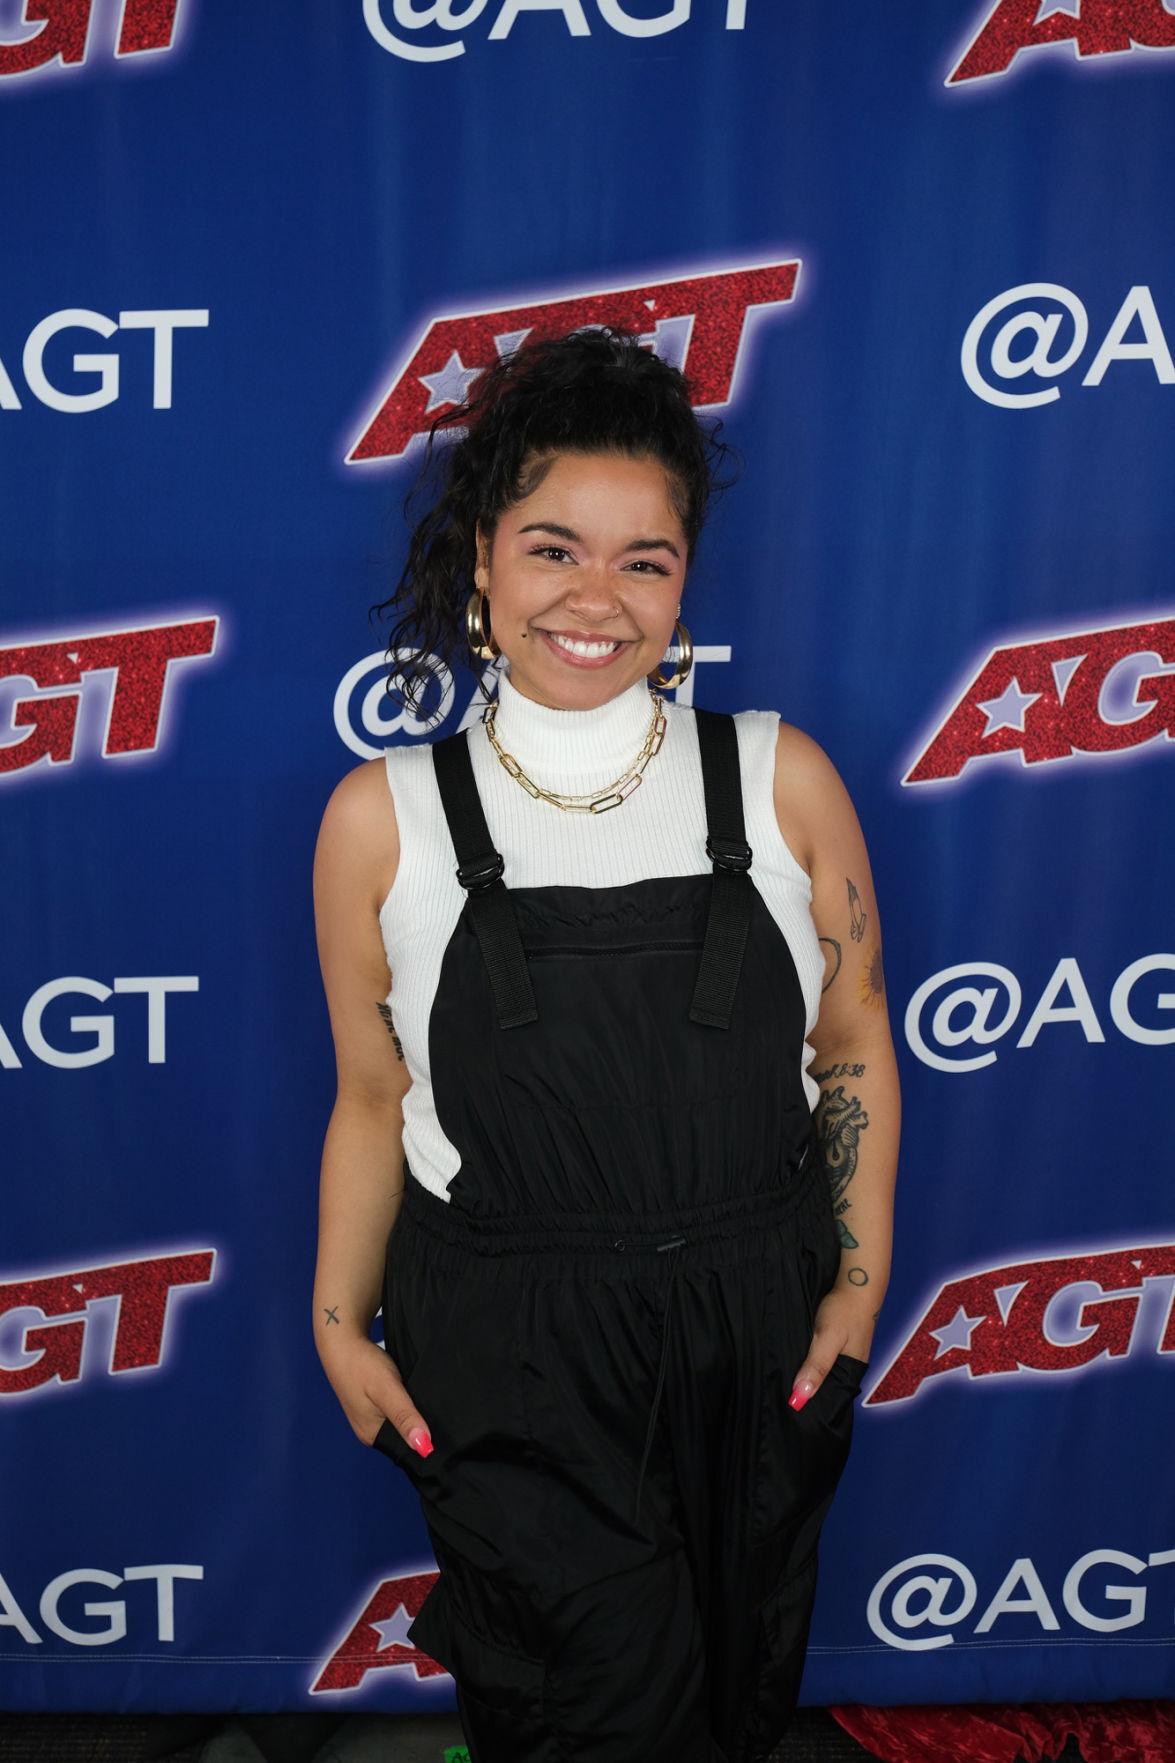 Brooke Mills Simpson on America's Got Talent